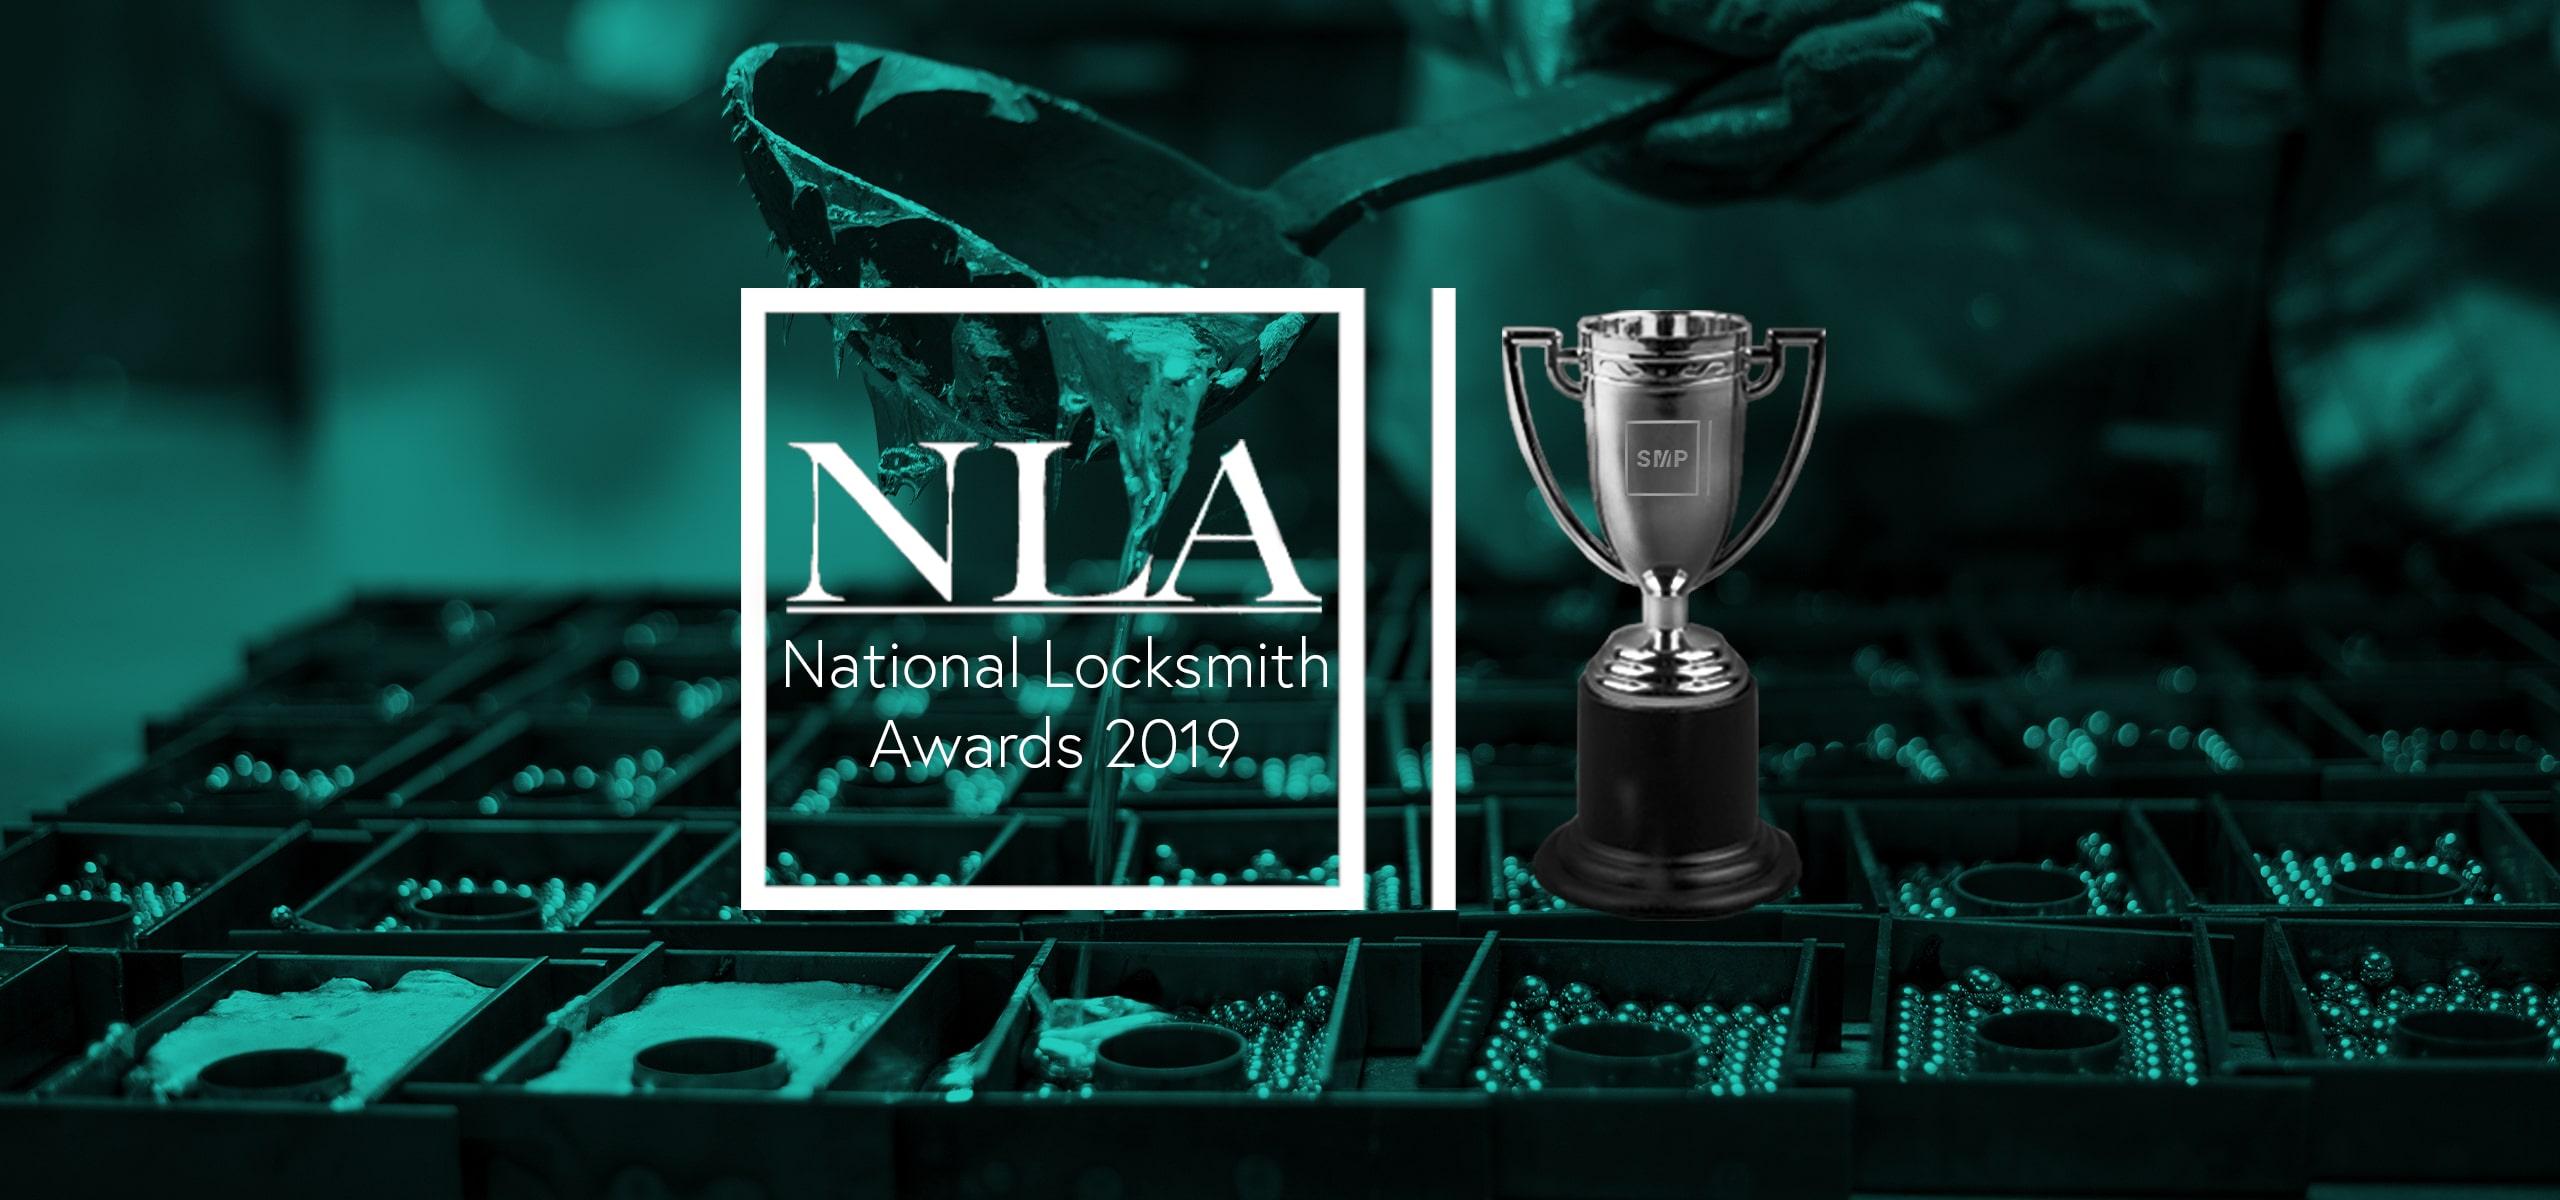 National Locksmith Awards - Safe Company of the Year 2019